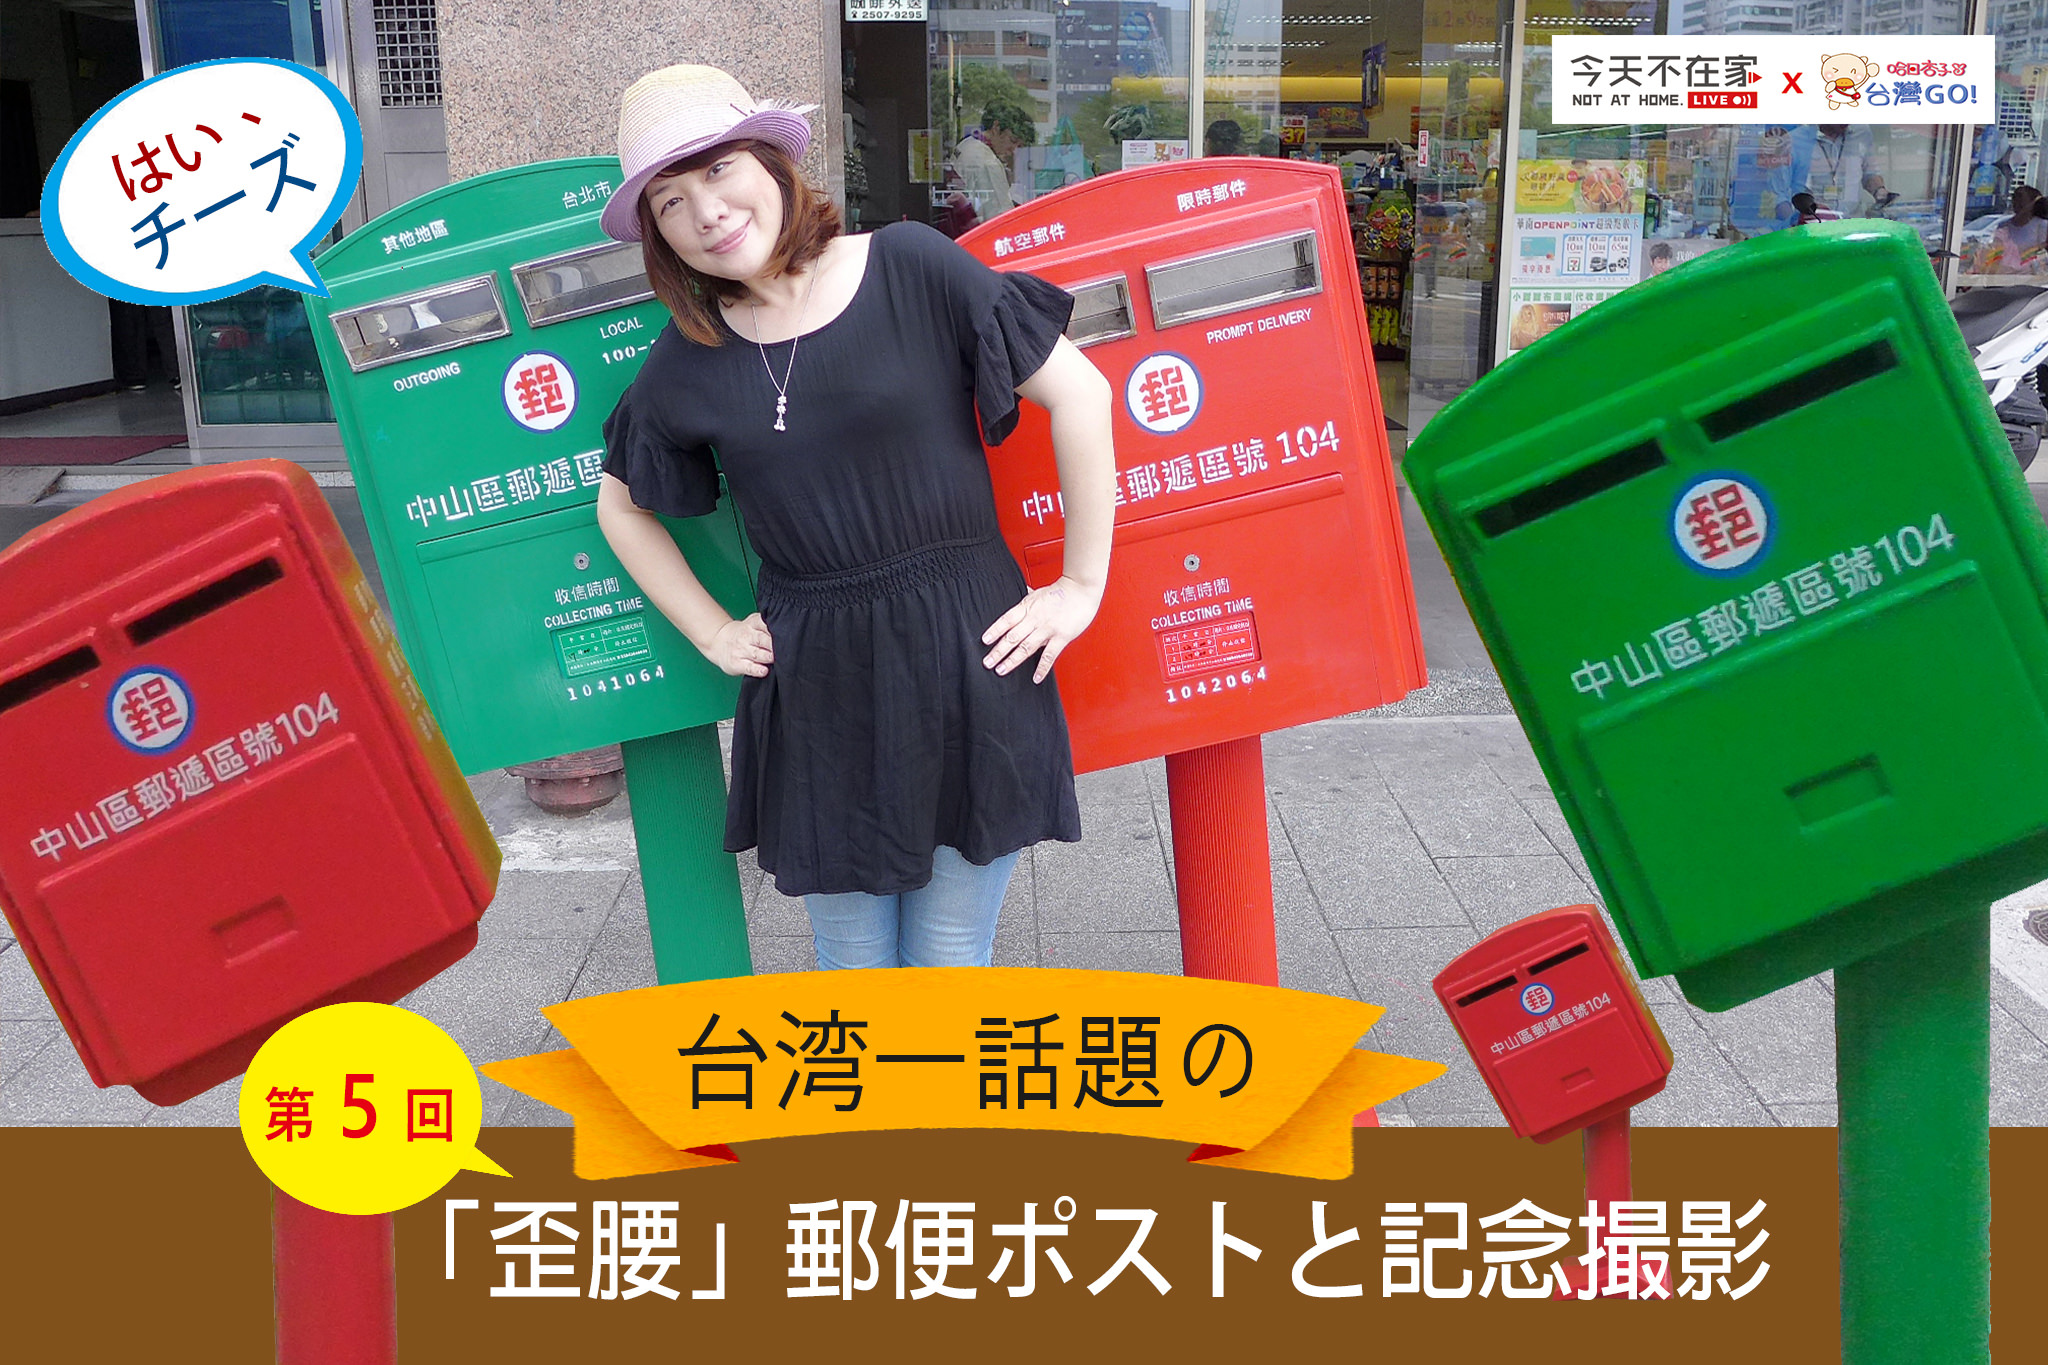 【哈日杏子*台灣GO】第 5 回 |歪腰郵筒・台湾一話題の郵便ポストと記念撮影